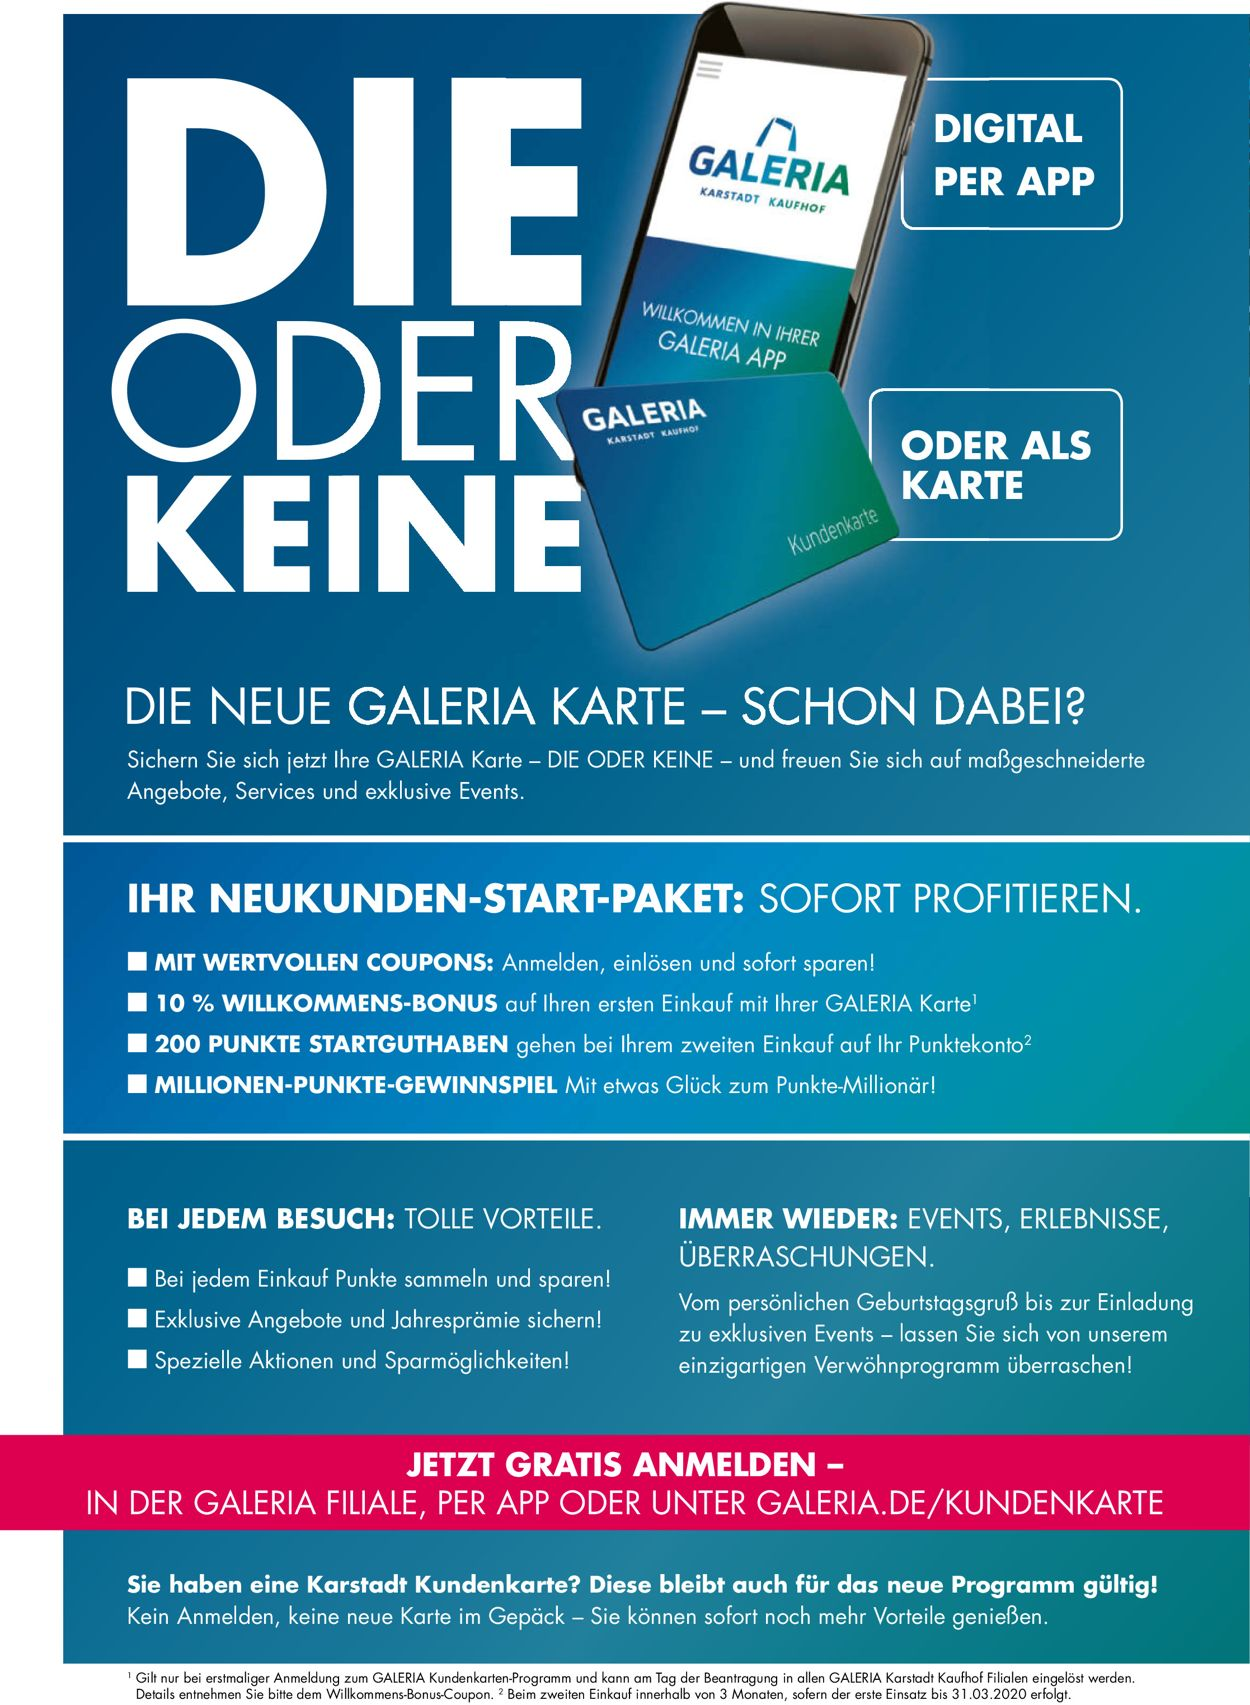 GALERIA Kaufhof Aktueller Prospekt 19.02 25.02.2020 [38